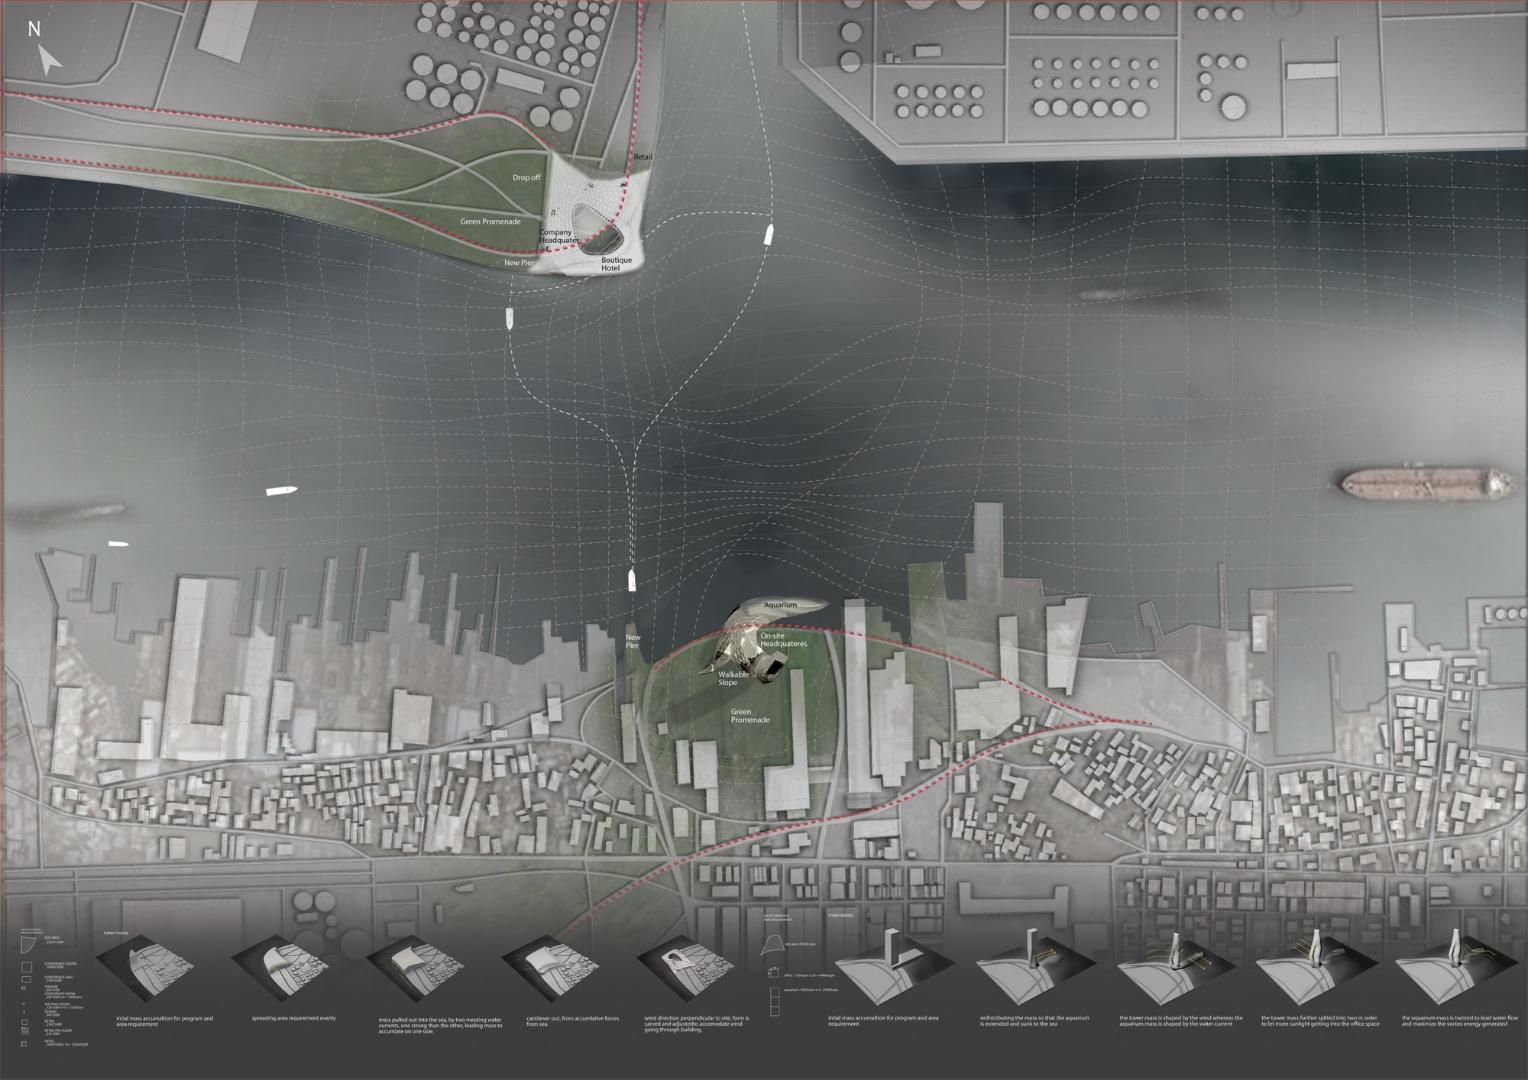 Enlarge Photo: Architecture & Urban Design III (ARCH 5001) 3